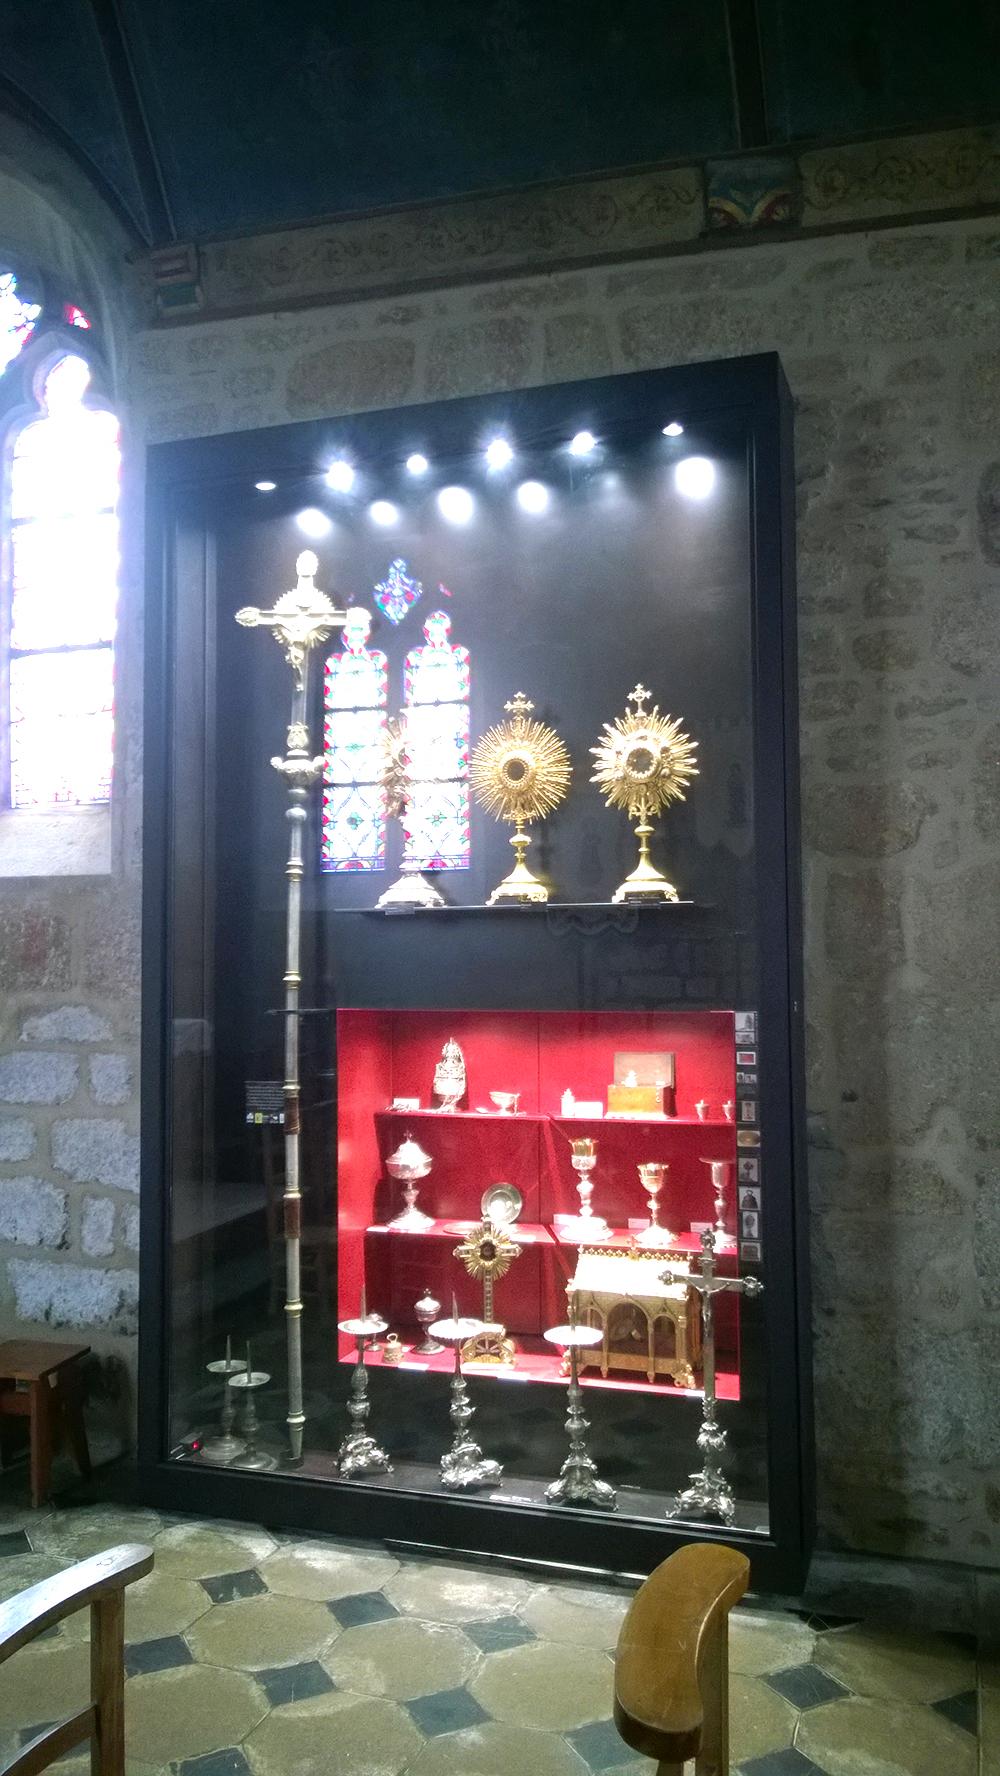 Ergué Gaberic Eglise Saint Guinal CLMH - XVI-XVIIème s.